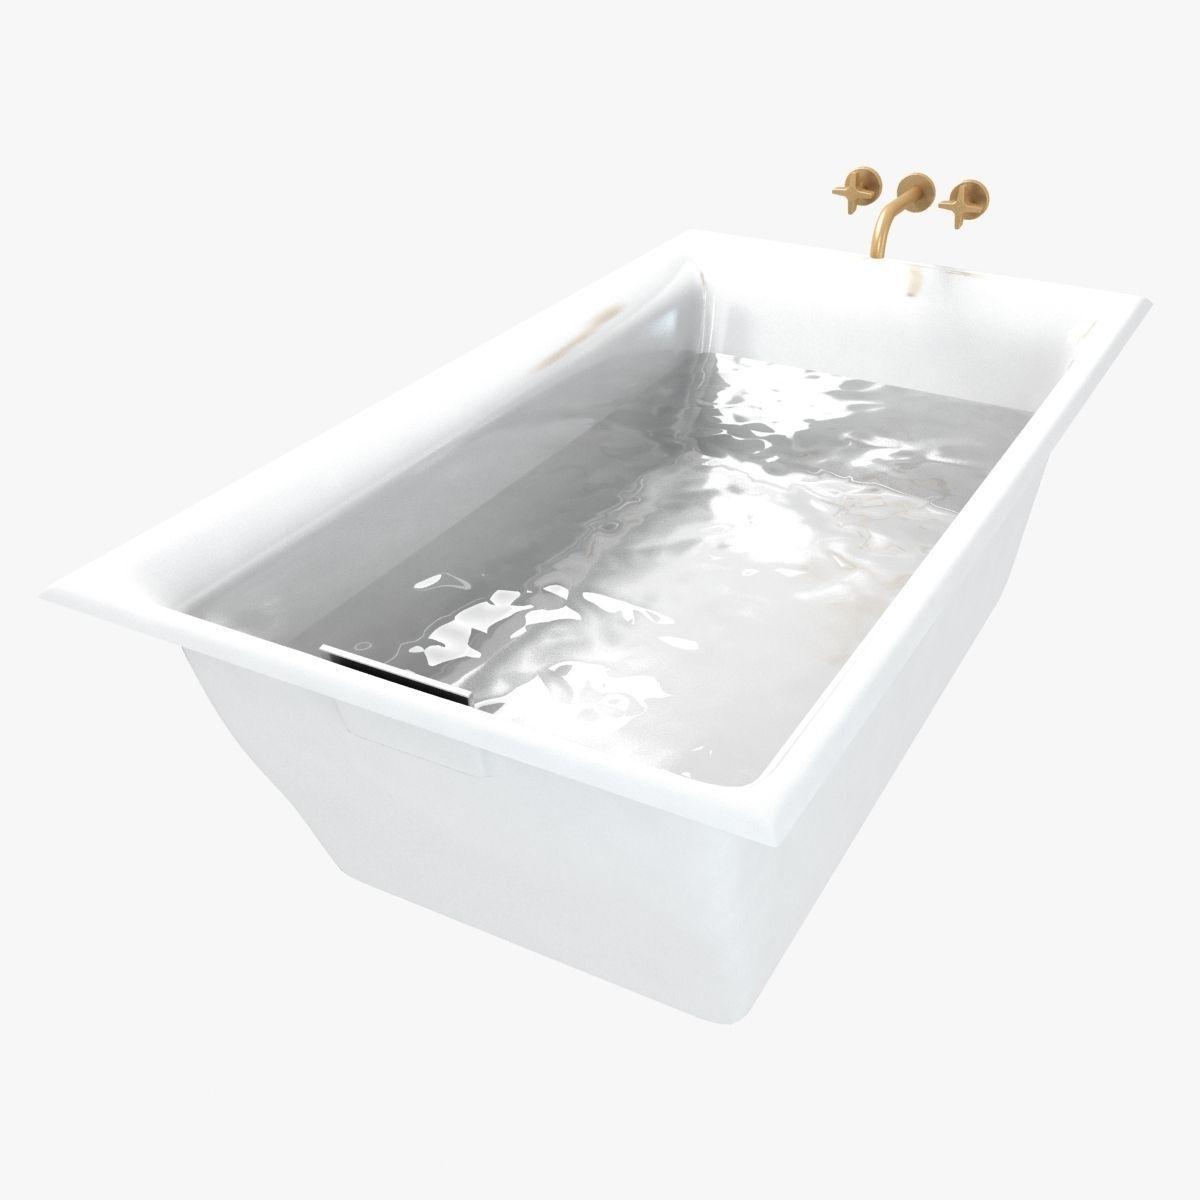 3D Kohler Bath Kallista Tap | CGTrader